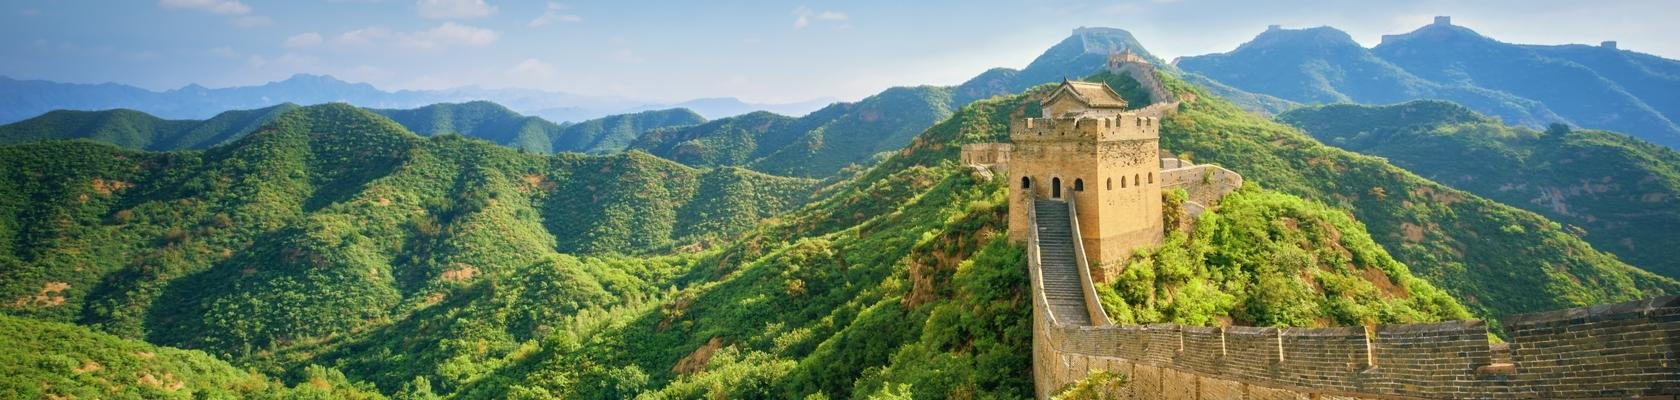 Grote Muur, Beijing